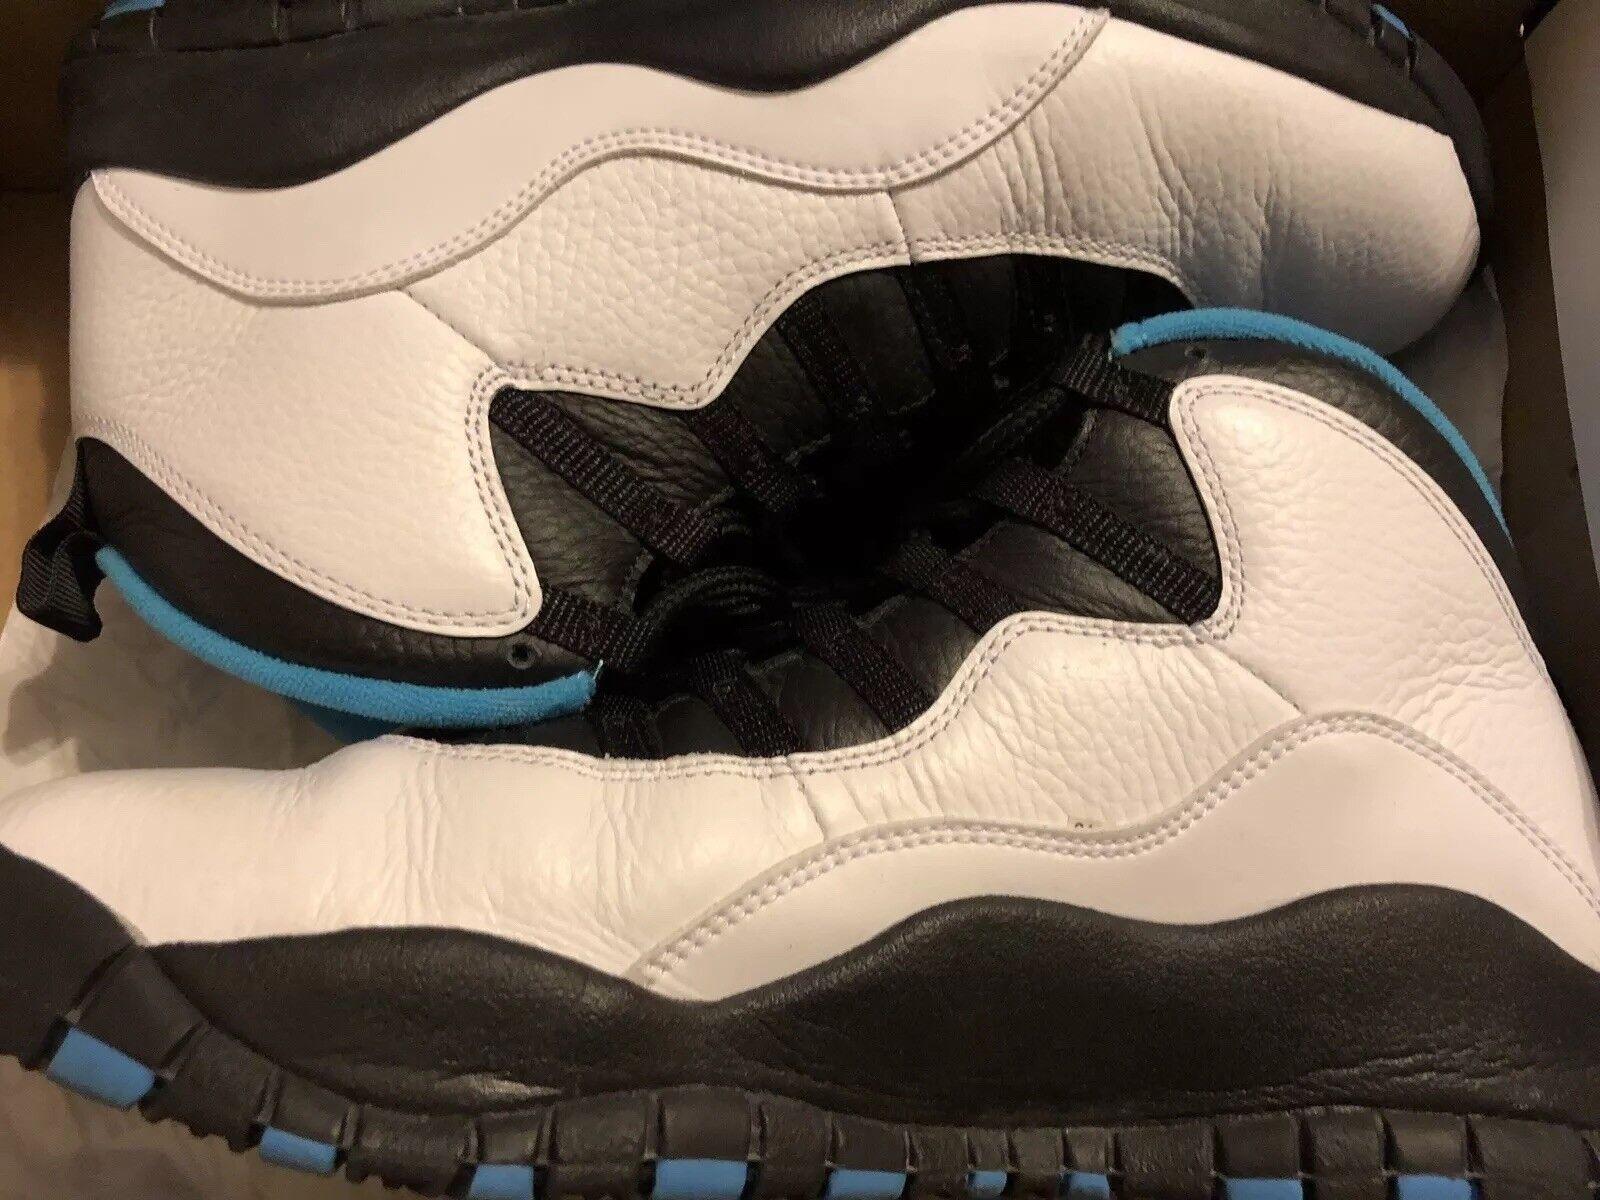 Nike Jordan Powder Baby Powder Jordan Azul Tamaño seminuevo 435511